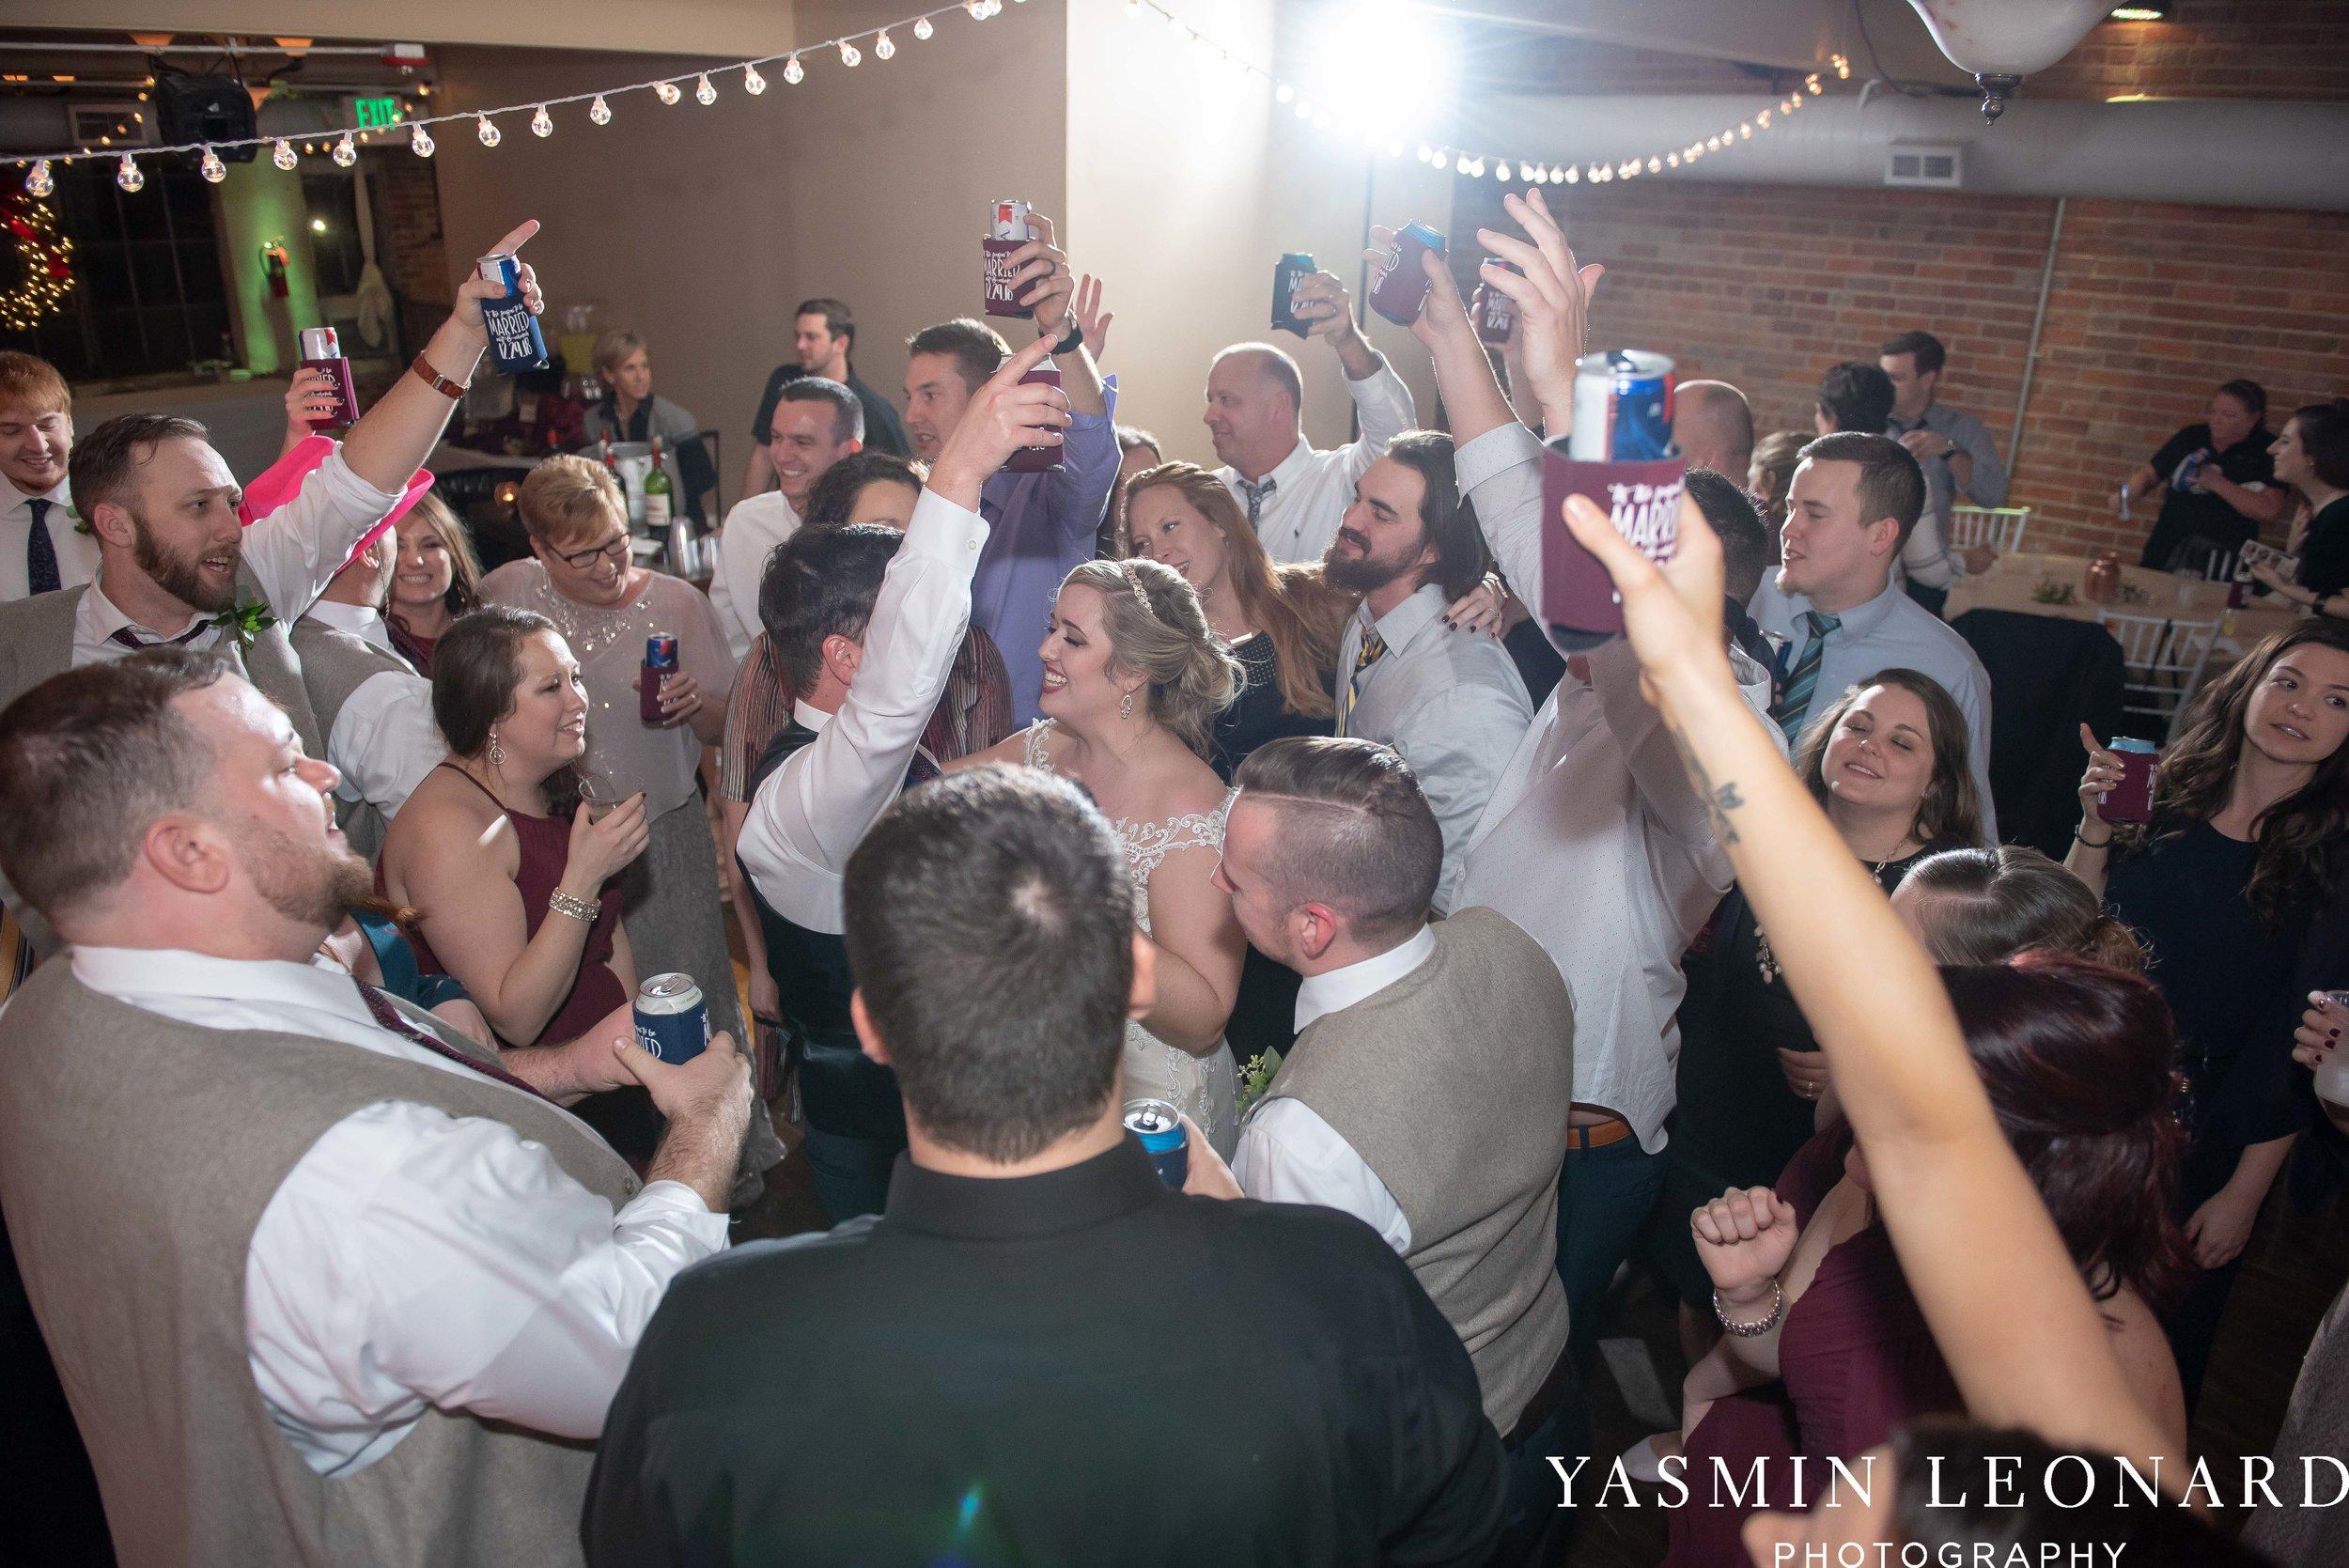 Rebekah and Matt - 105 Worth Event Centre - Yasmin Leonard Photography - Asheboro Wedding - NC Wedding - High Point Weddings - Triad Weddings - Winter Wedding-82.jpg